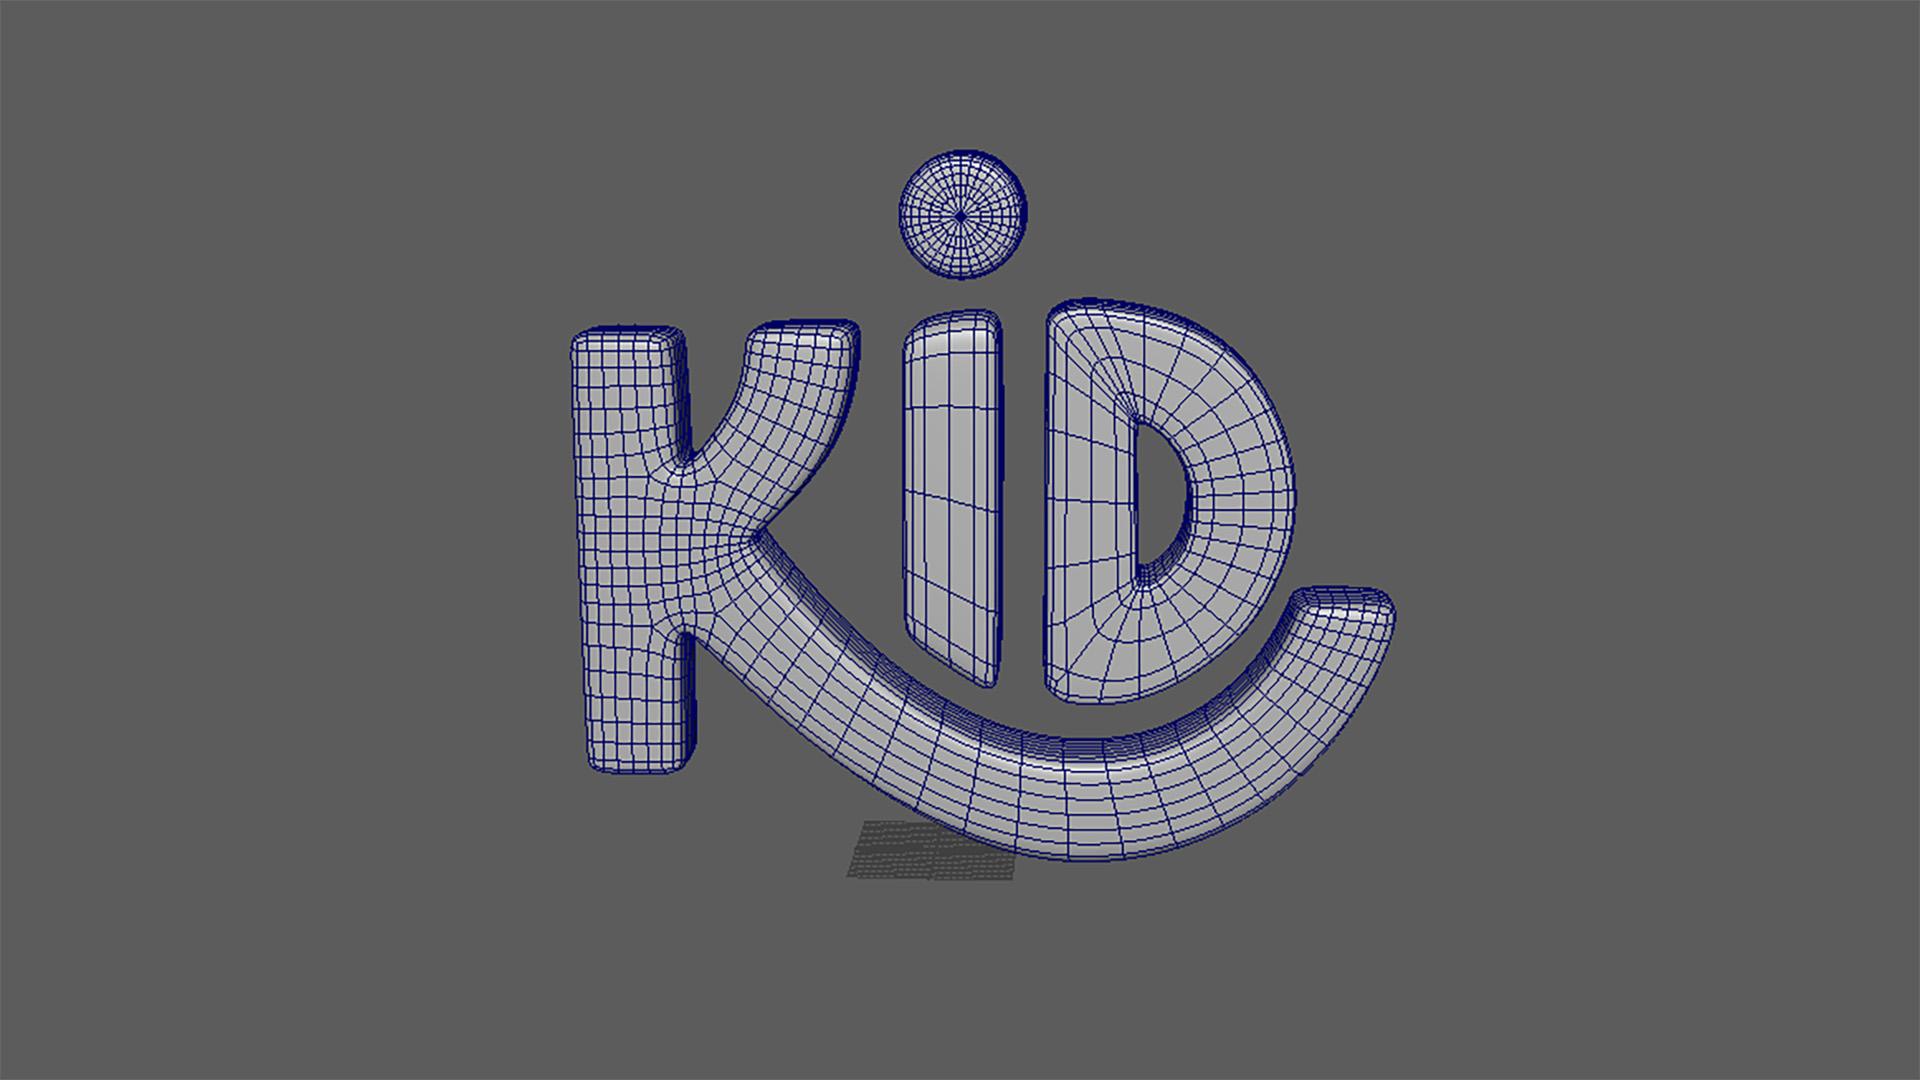 roofstudio_juni-learning_kid-02-2